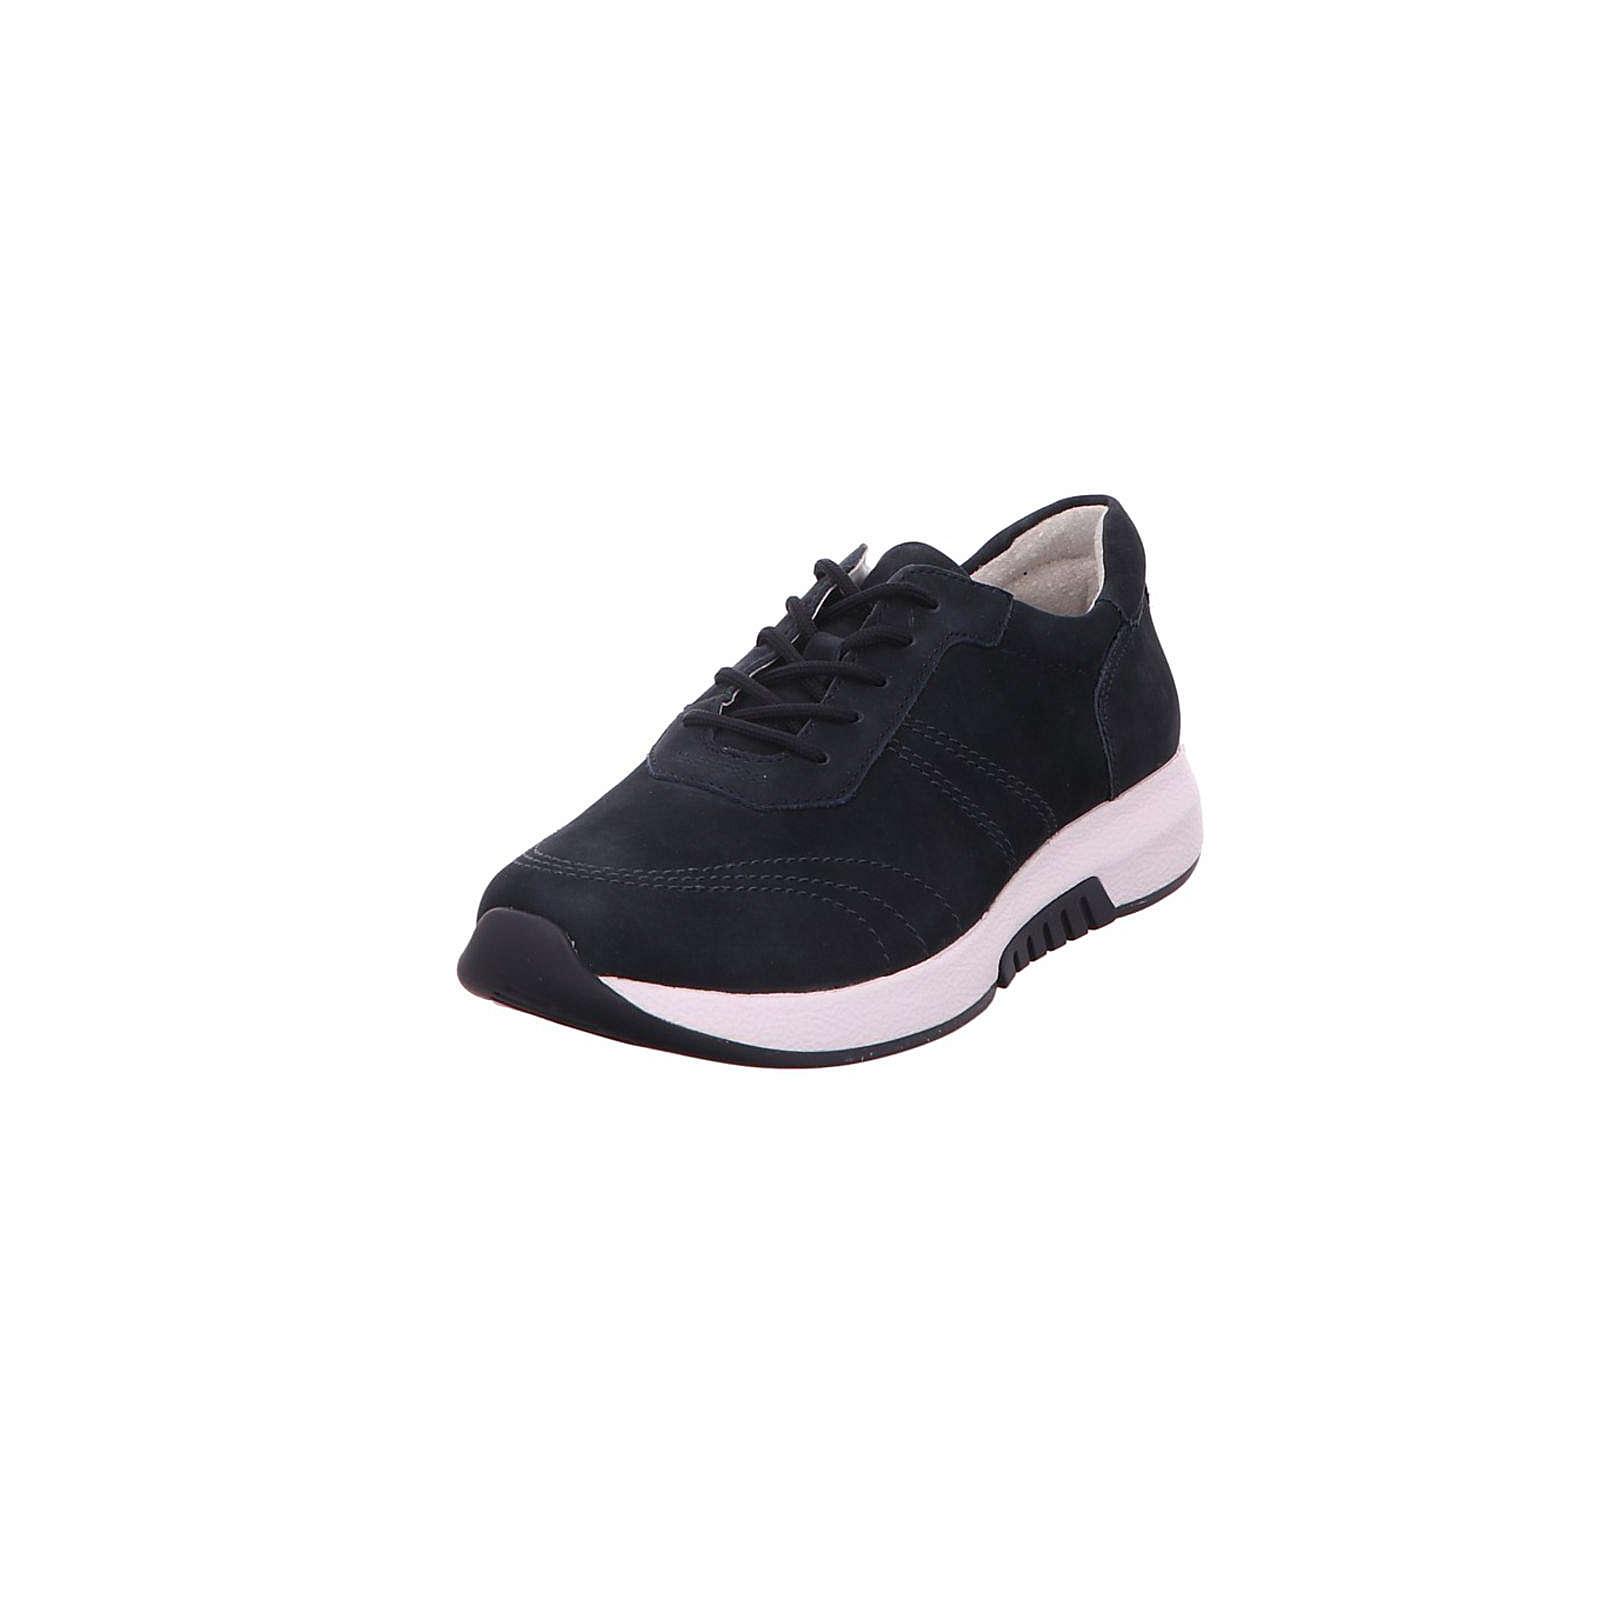 Gabor Sneakers blau blau Damen Gr. 37